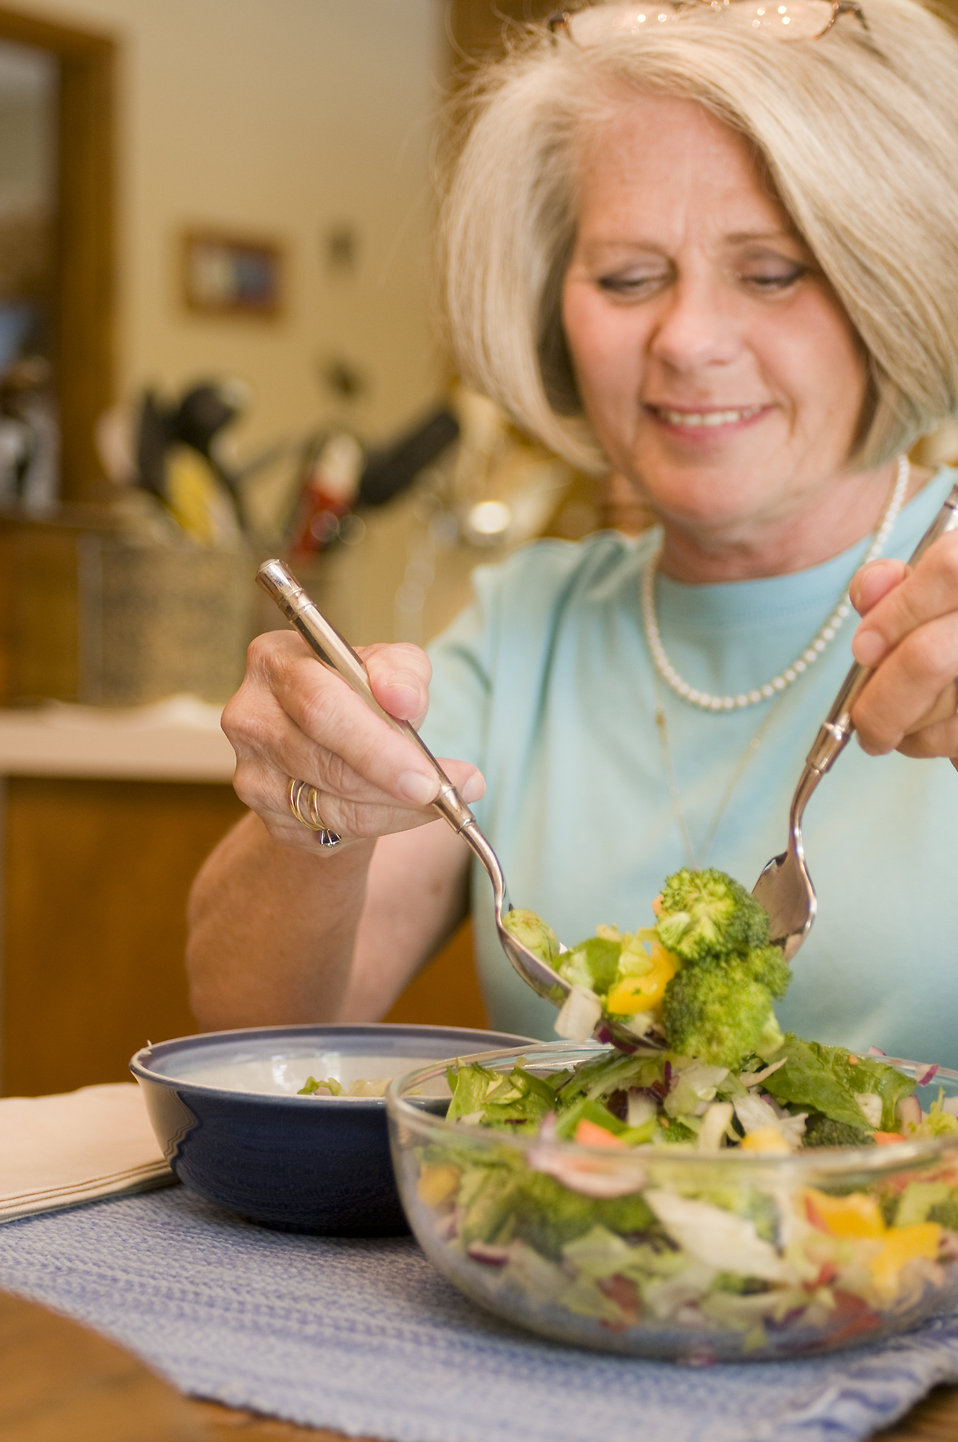 A woman eating a fresh salad : Free Stock Photo